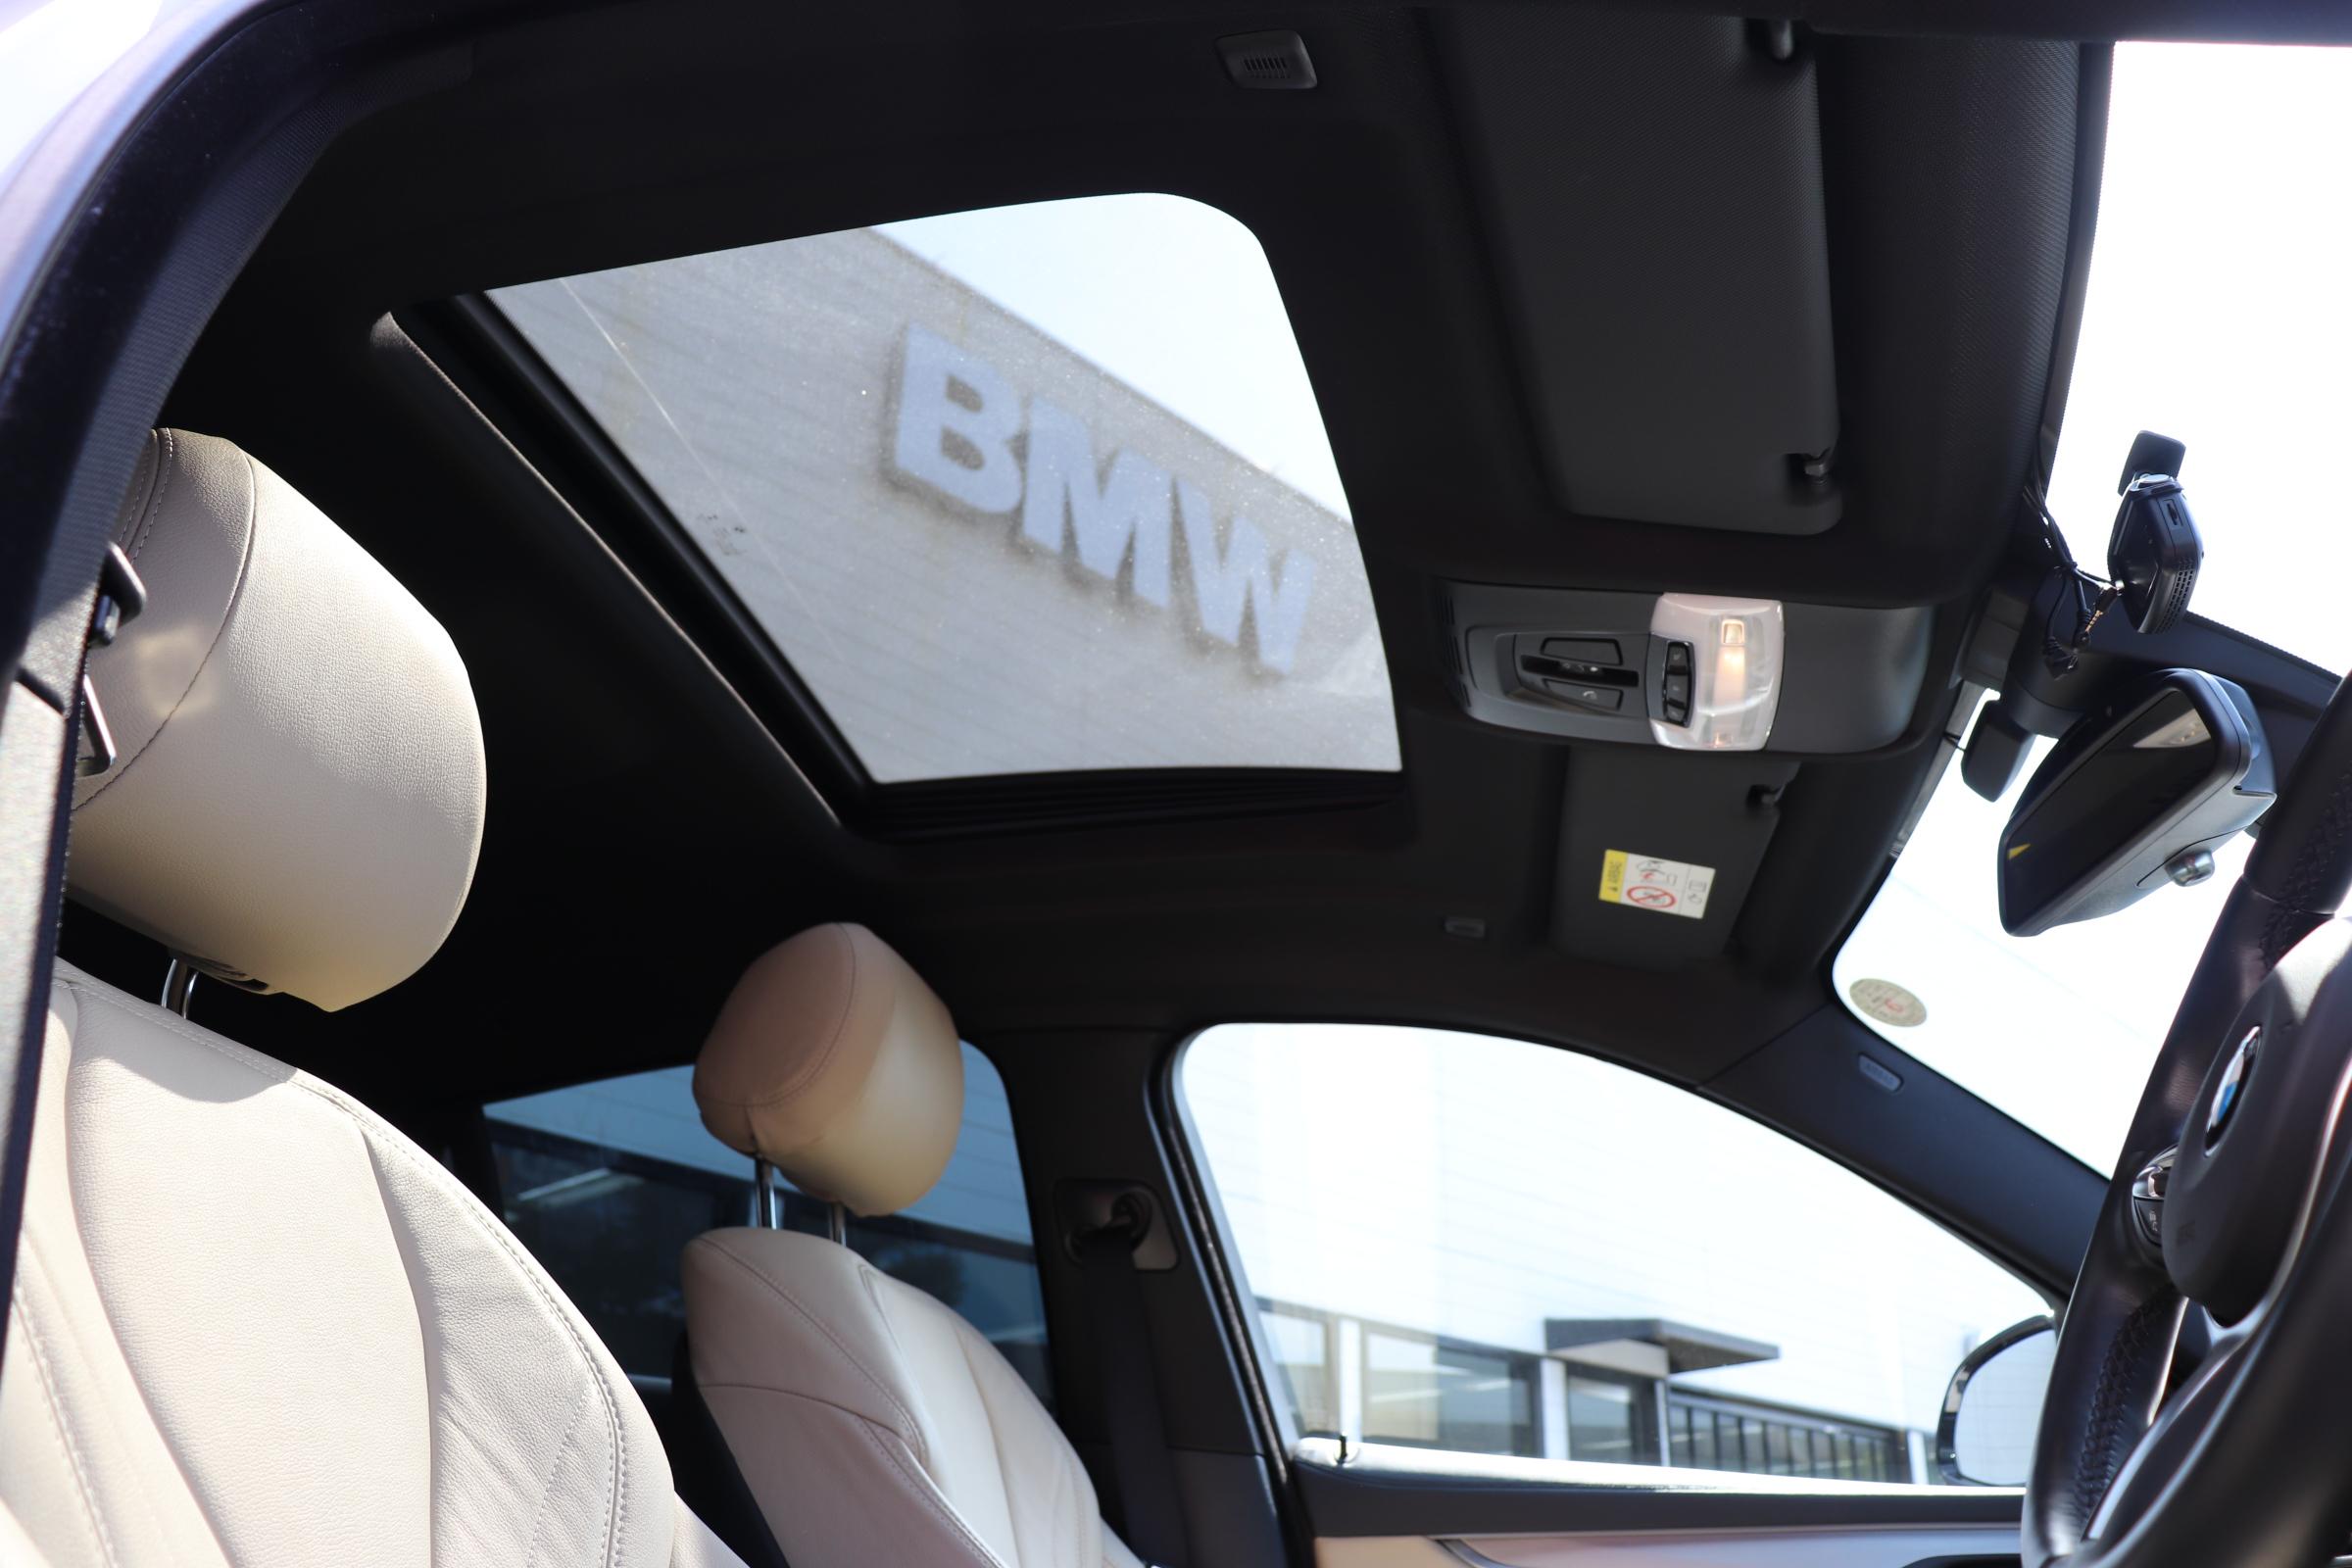 X6 xDrive35i Mスポーツ サンルーフ ヘッドアップディスプレイ パワーバックドア車両画像09